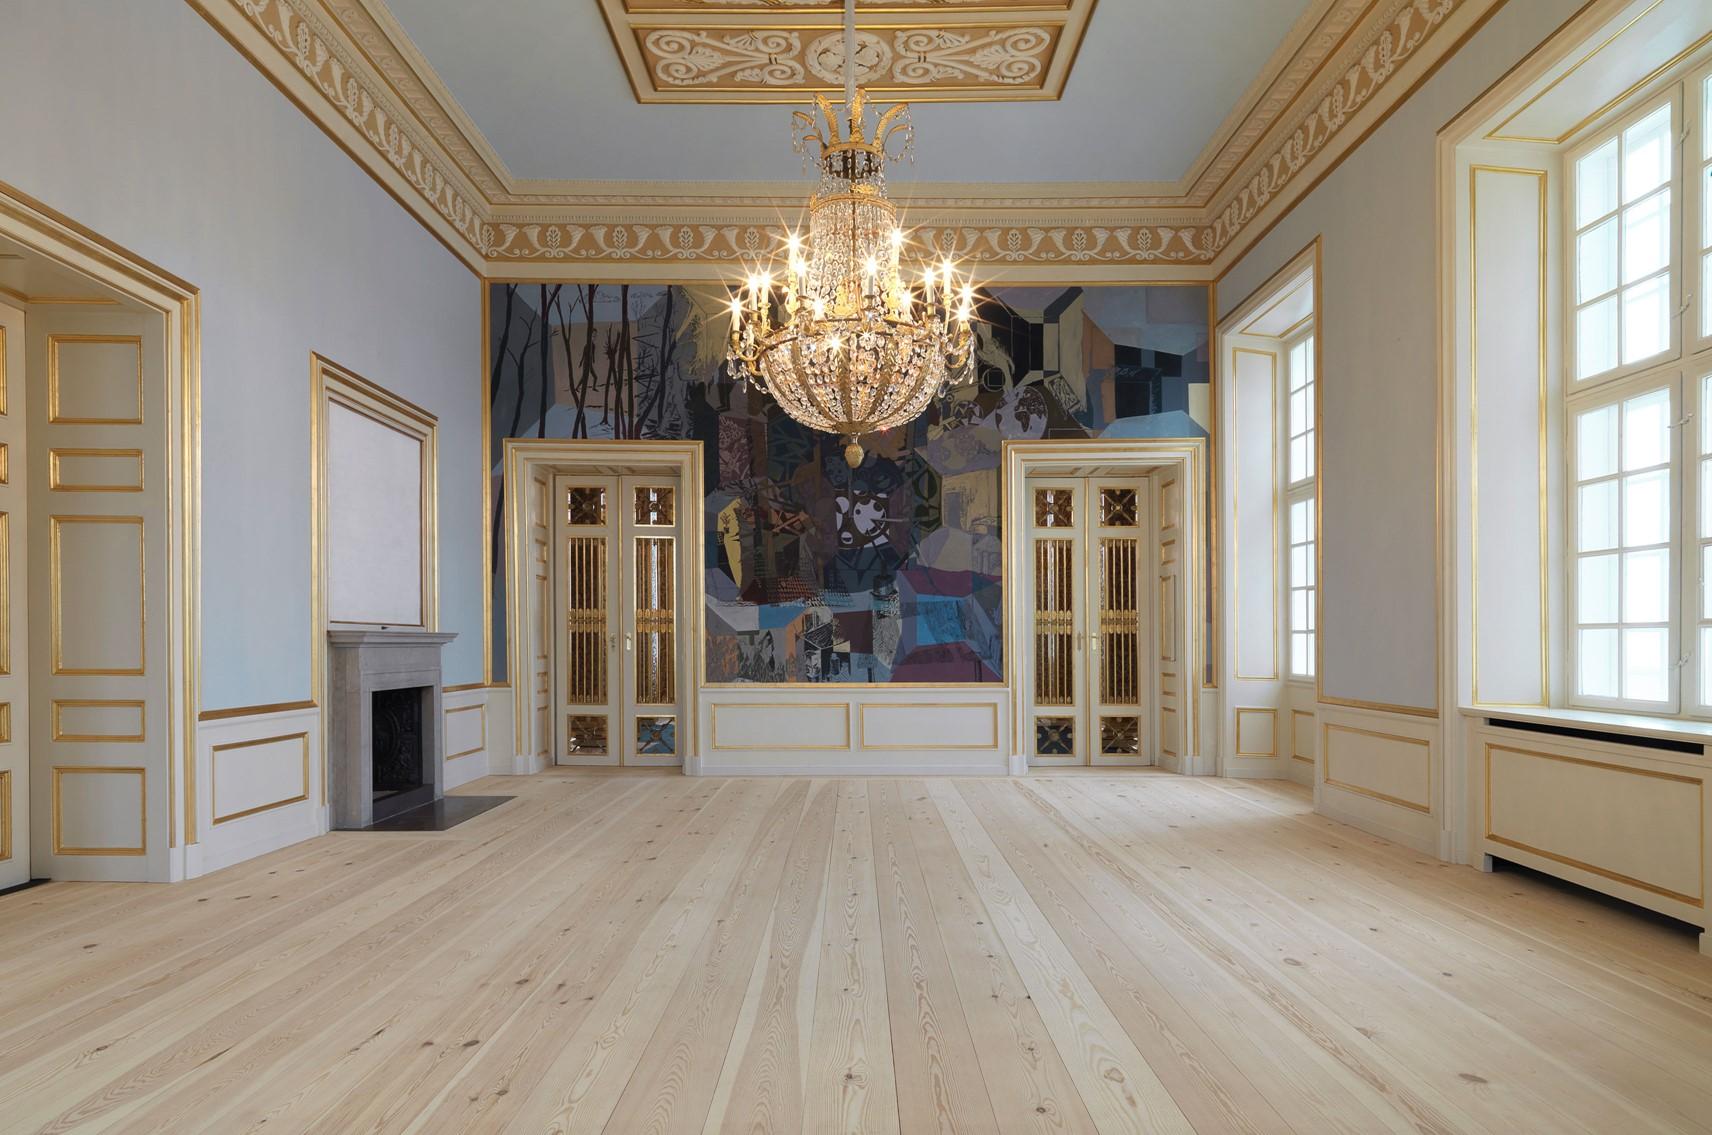 pine-plank-floor_natural-soap_amailienborg-slot-copenhagen_dinesen.jpg